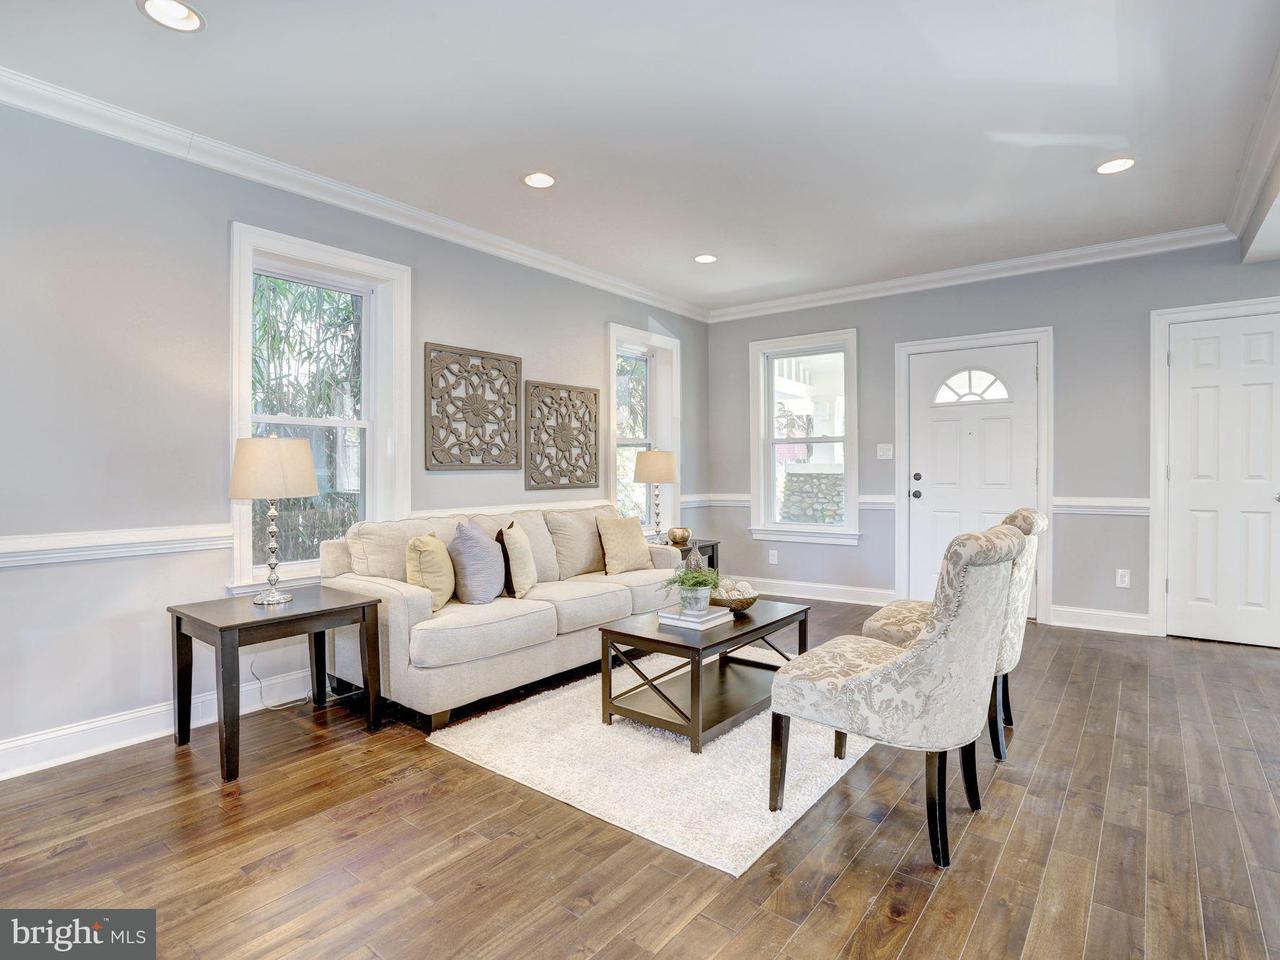 Additional photo for property listing at 2908 26th St Ne 2908 26th St Ne Washington, 哥倫比亞特區 20018 美國